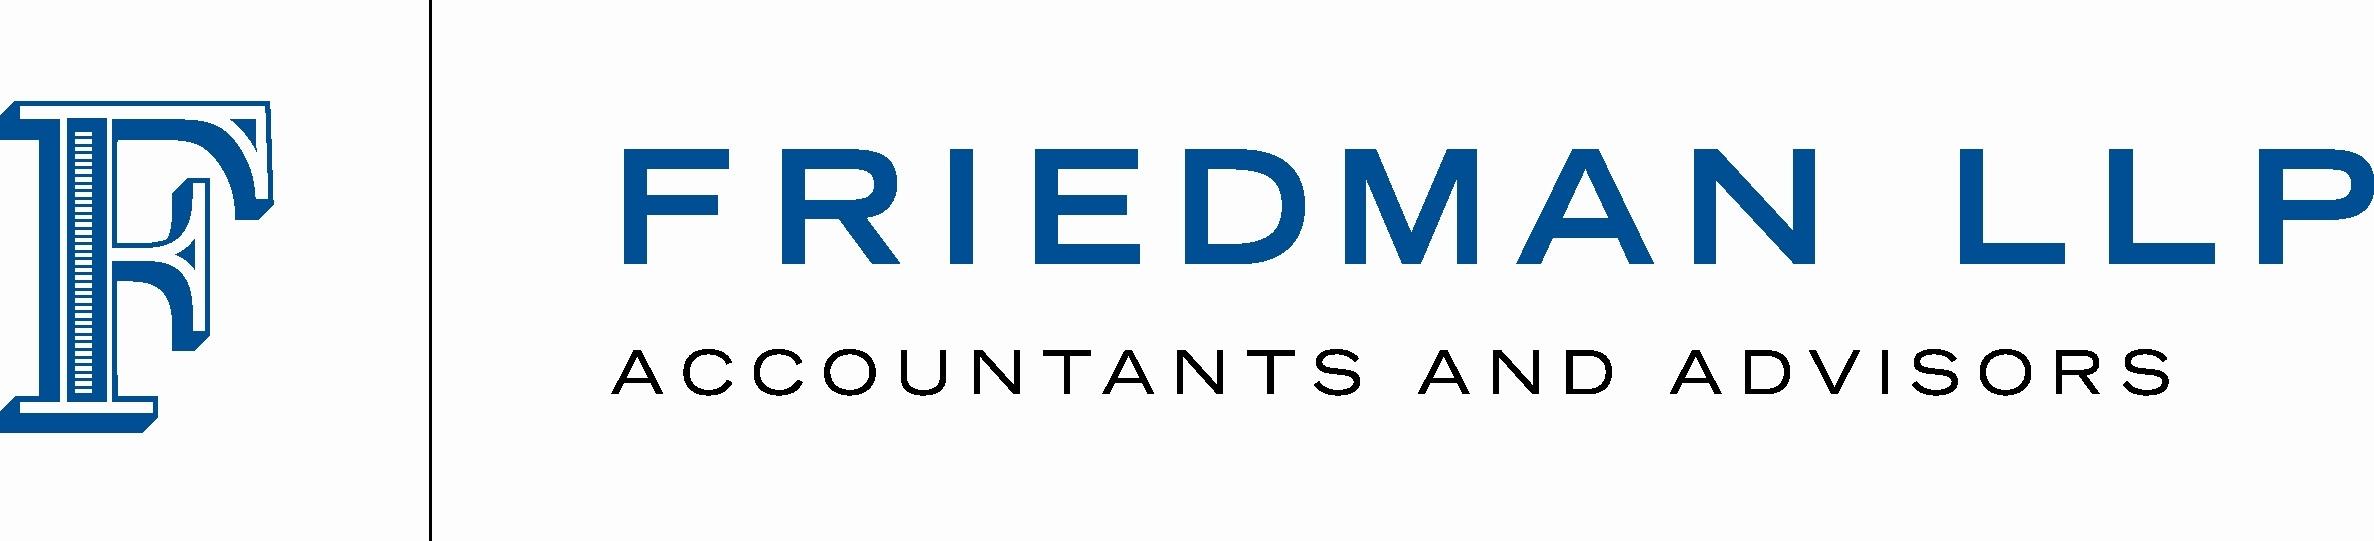 friedman_logo_CMYK.jpg